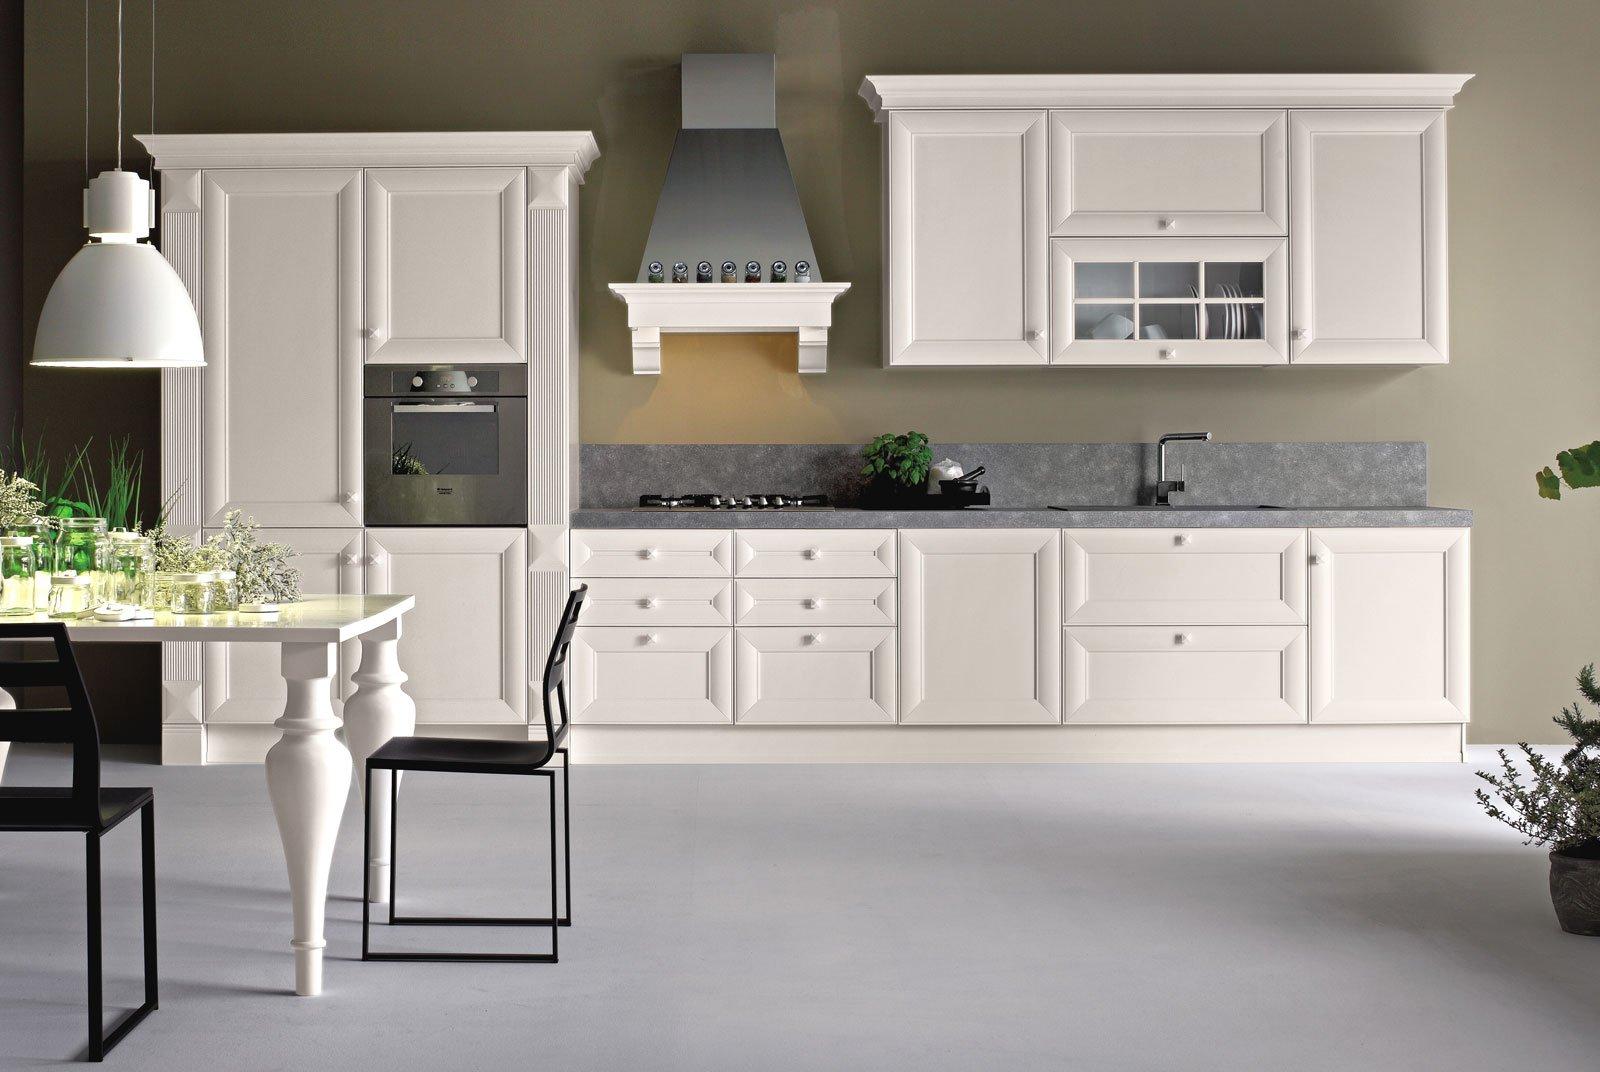 Cucina bianca il fascino eterno della luminosit cose di casa - Cucina bianca e rossa ...